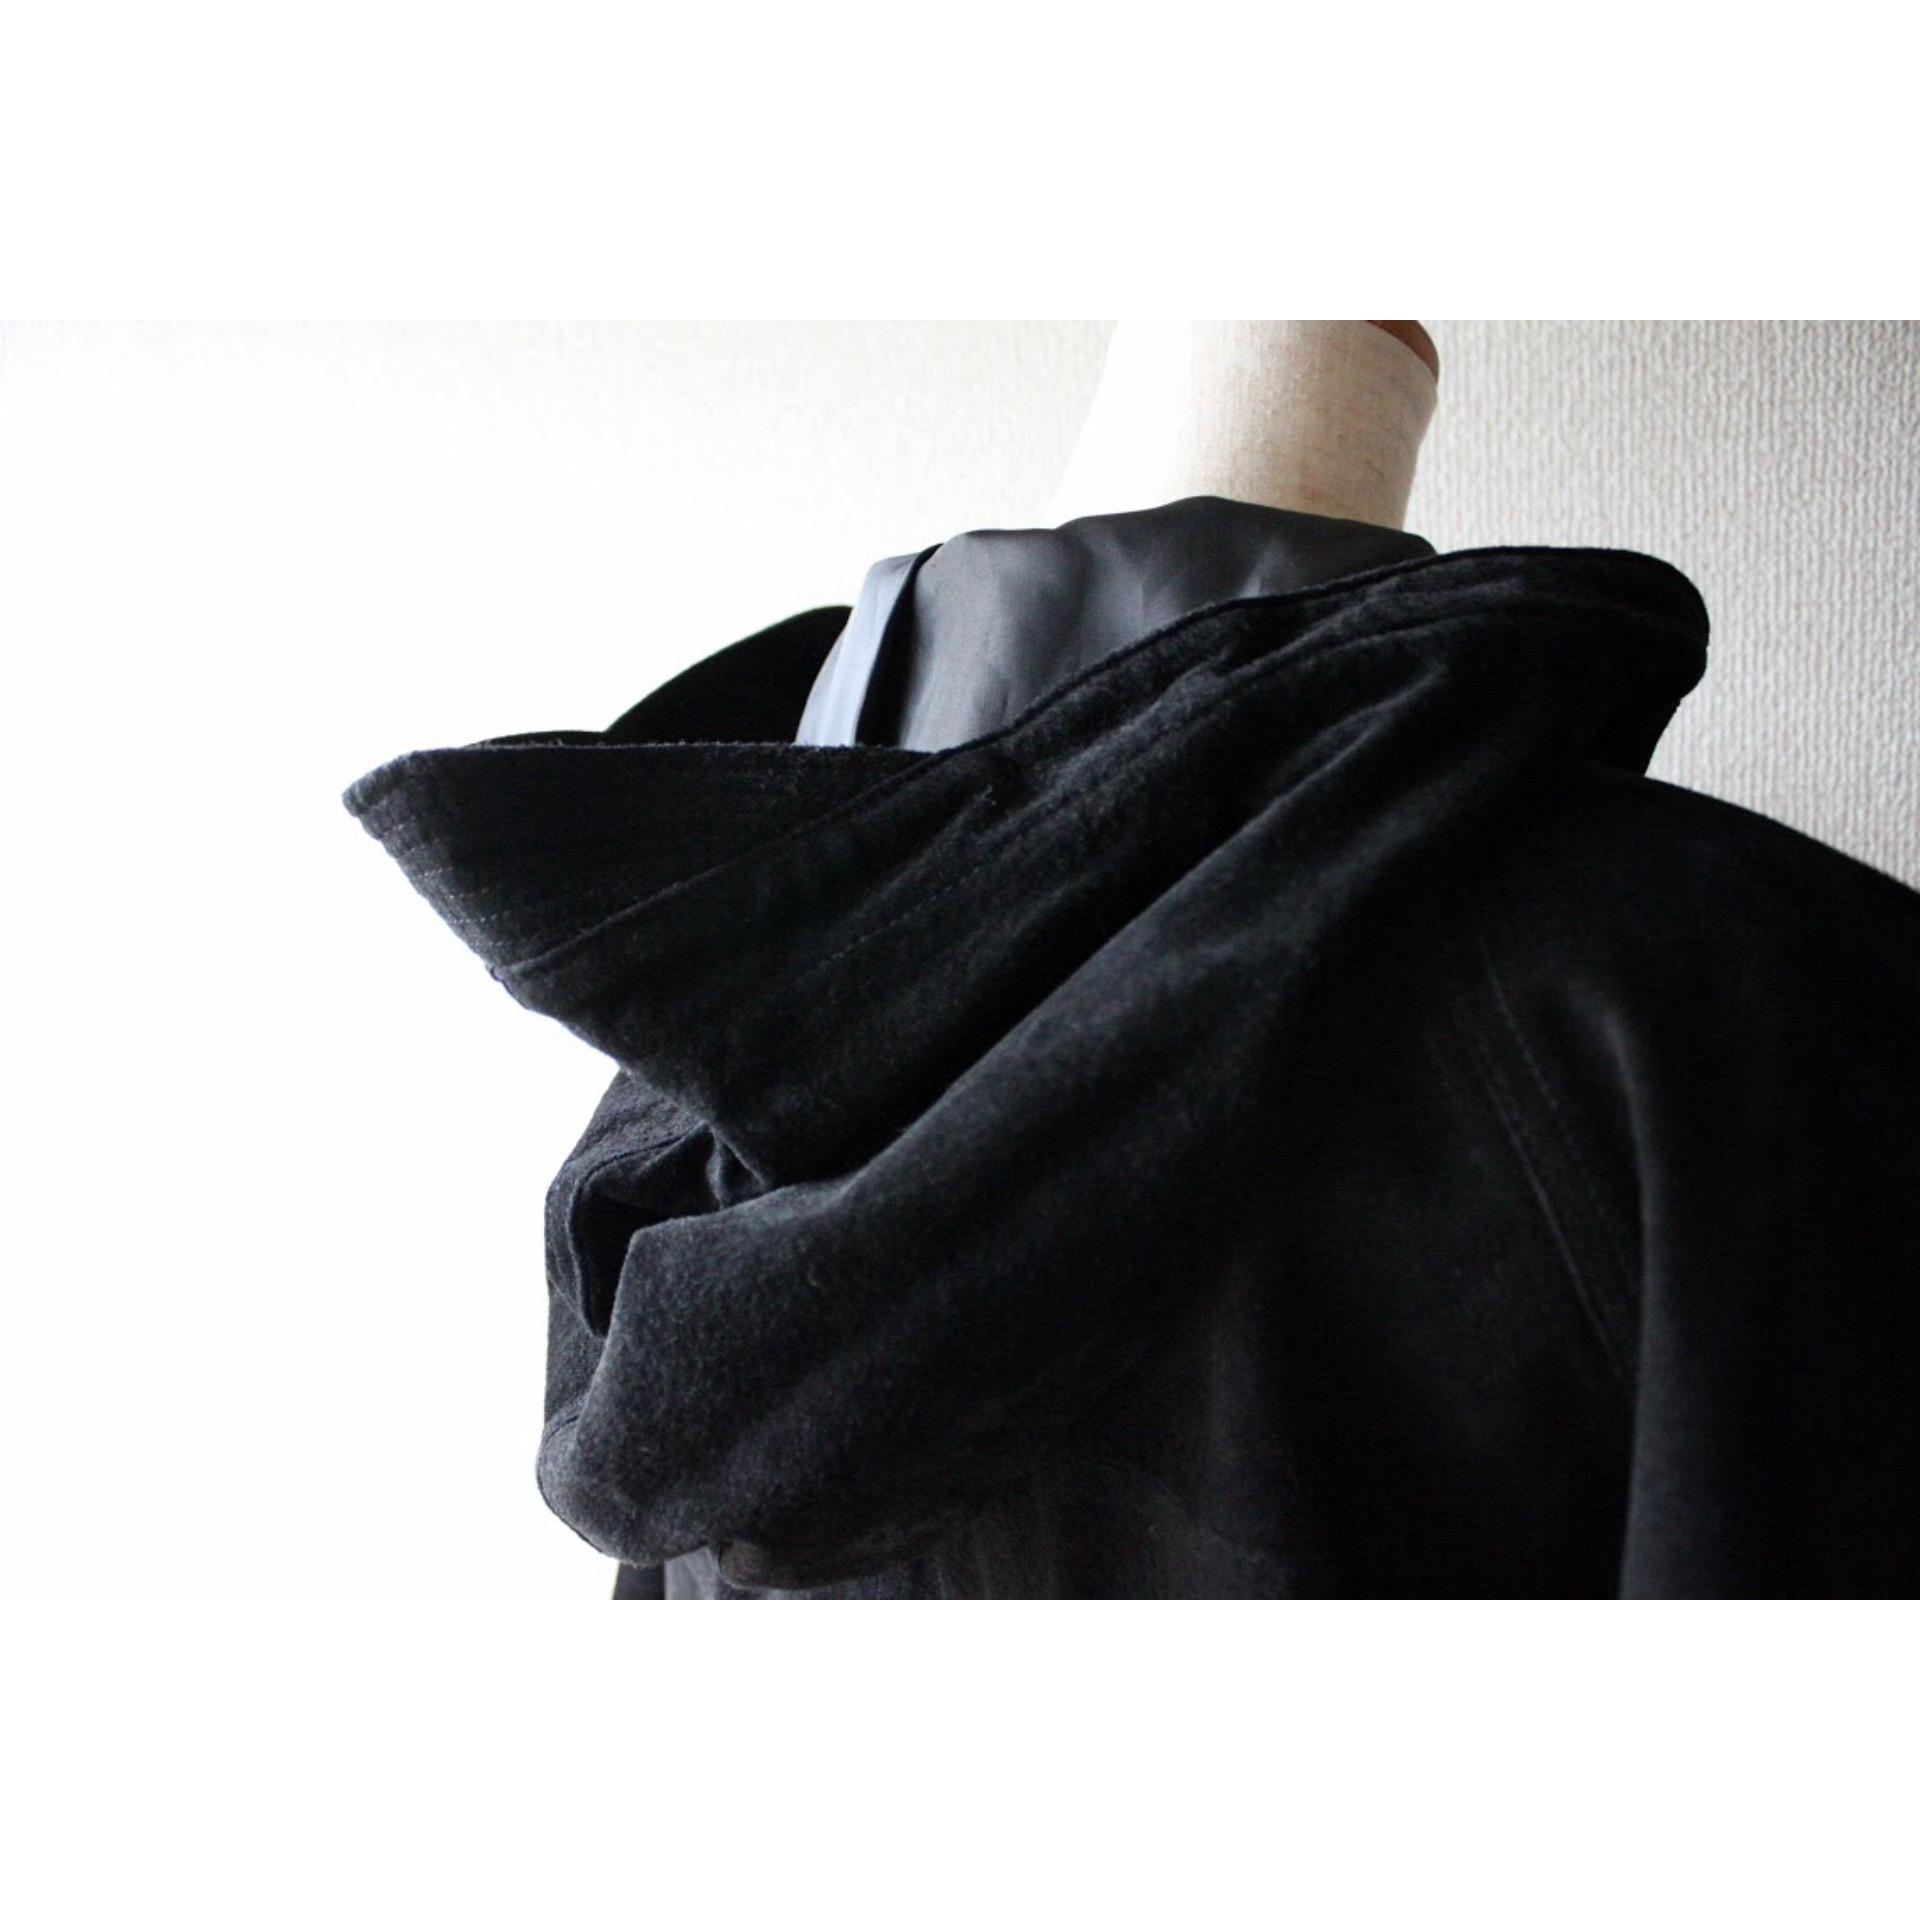 Vintage suede lace up jacket